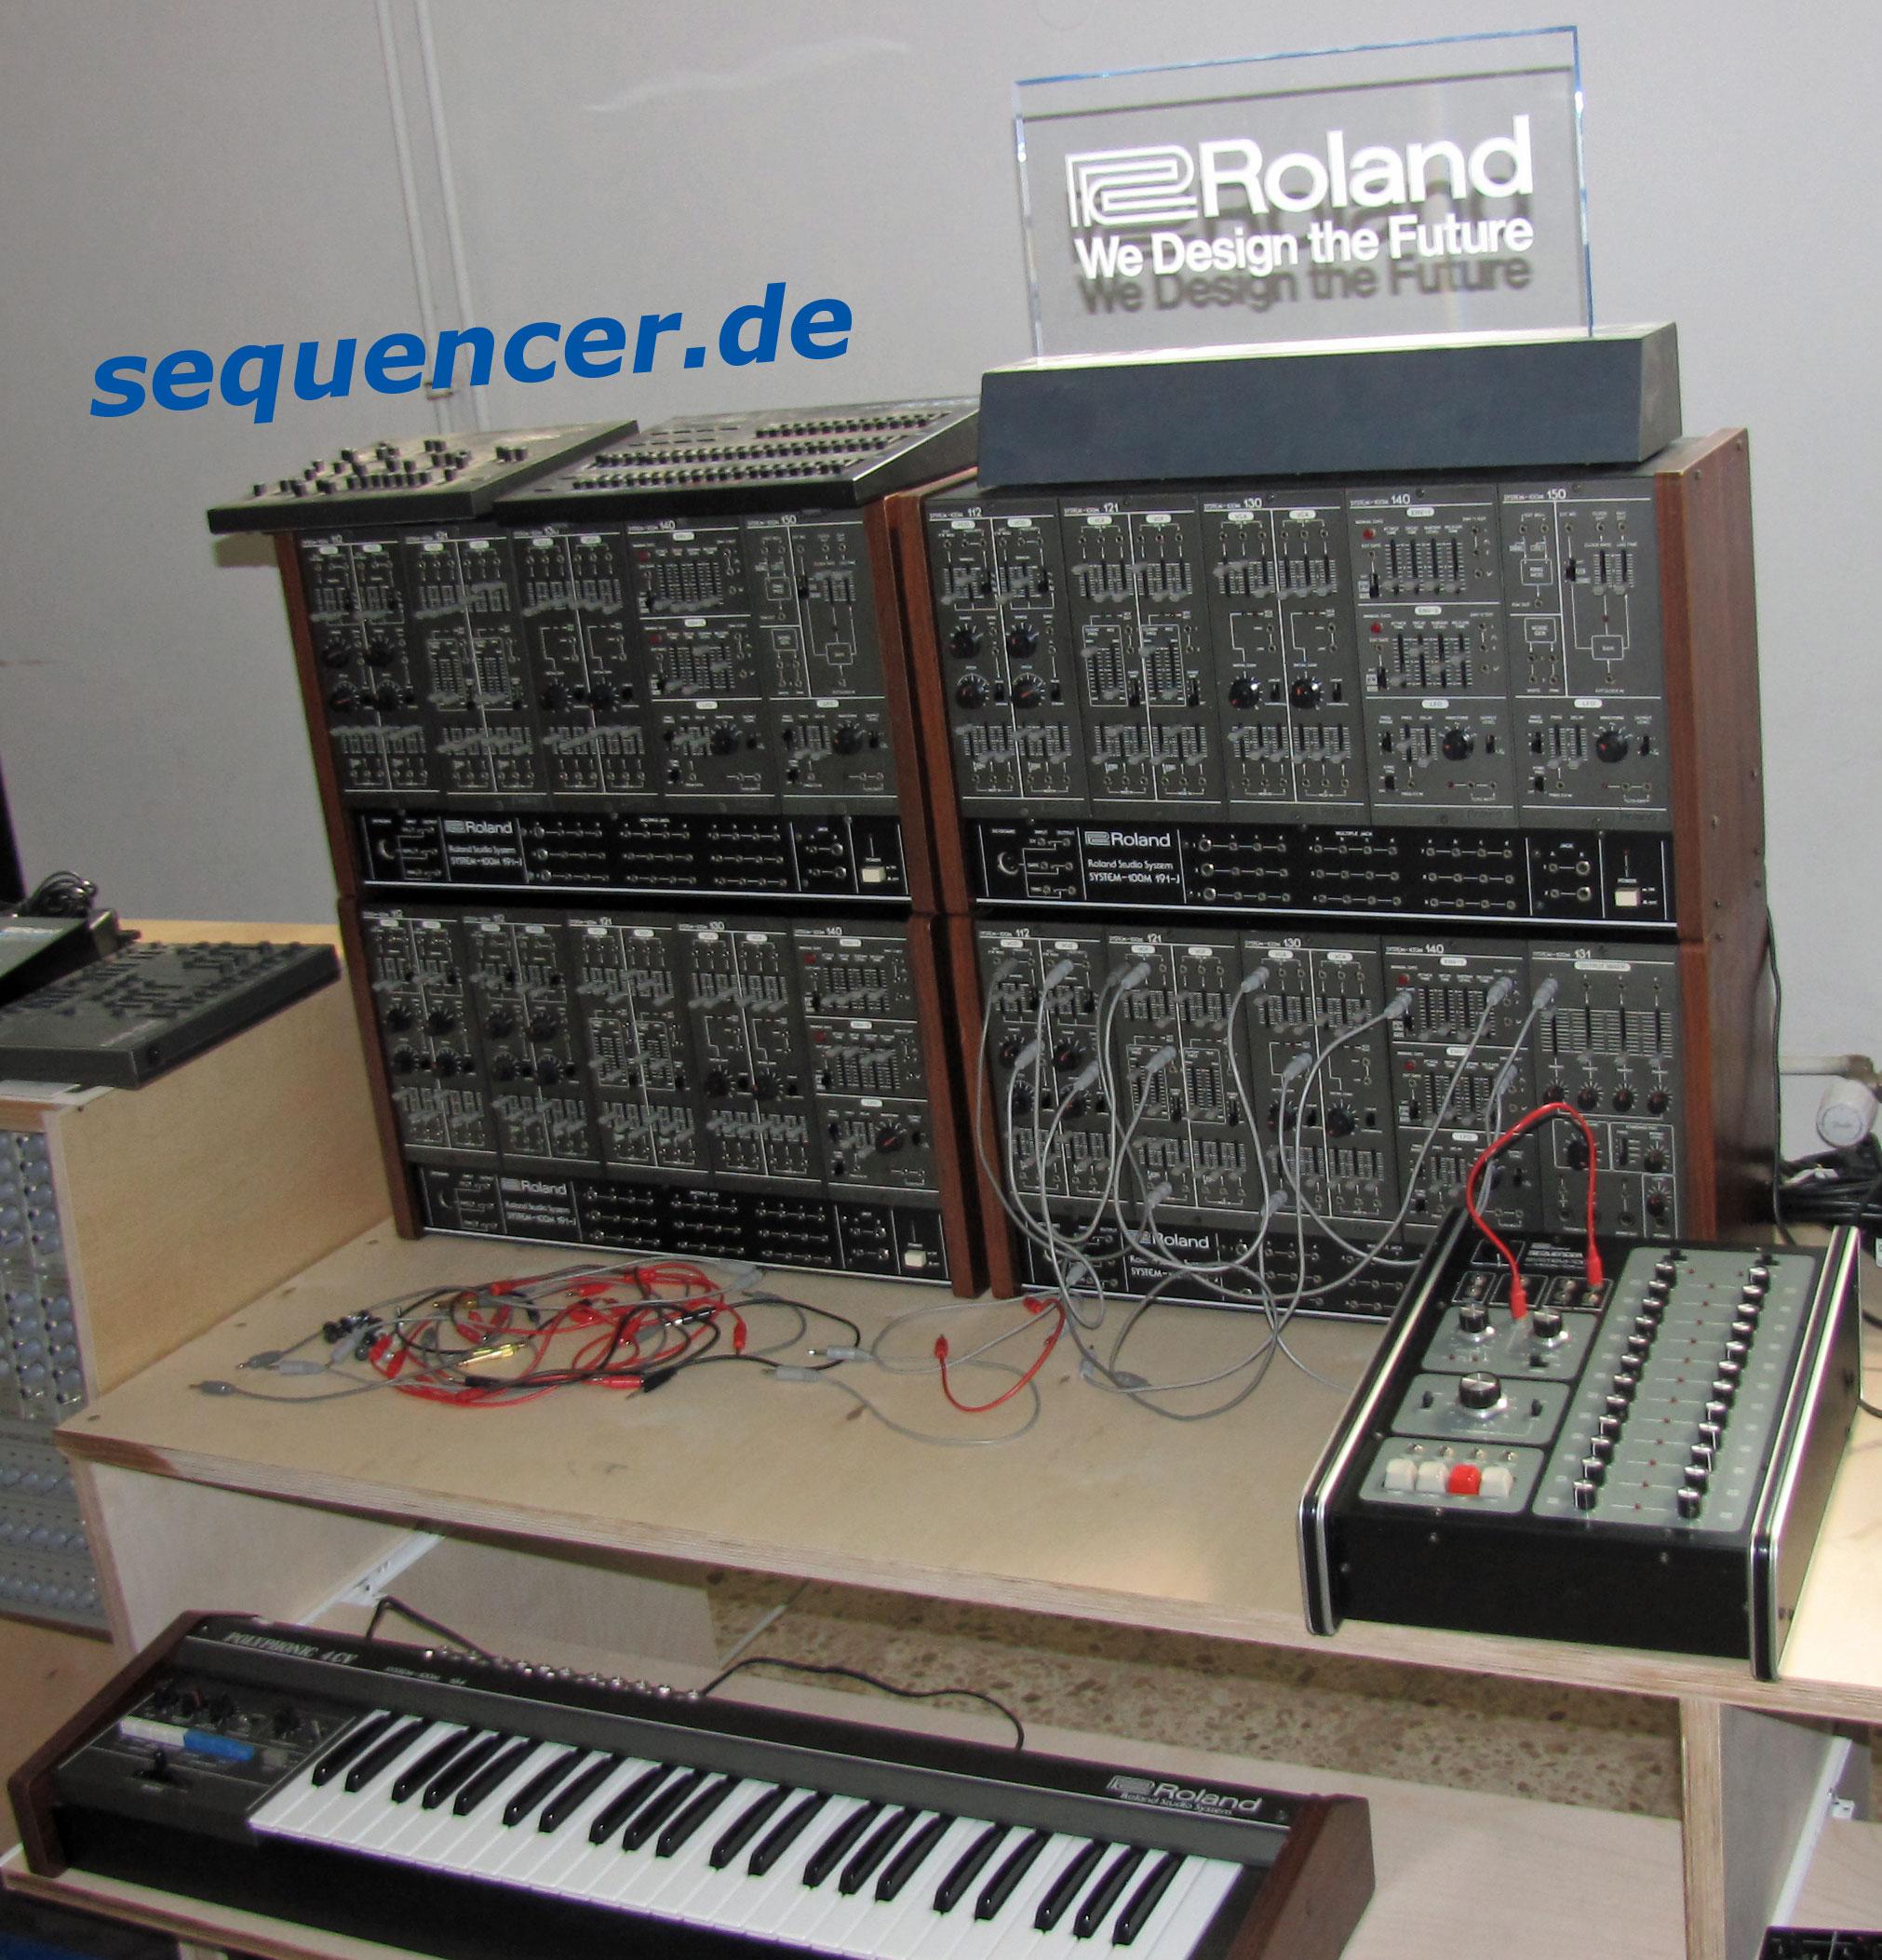 roland system 100m modular synthesizer analog step sequencer. Black Bedroom Furniture Sets. Home Design Ideas